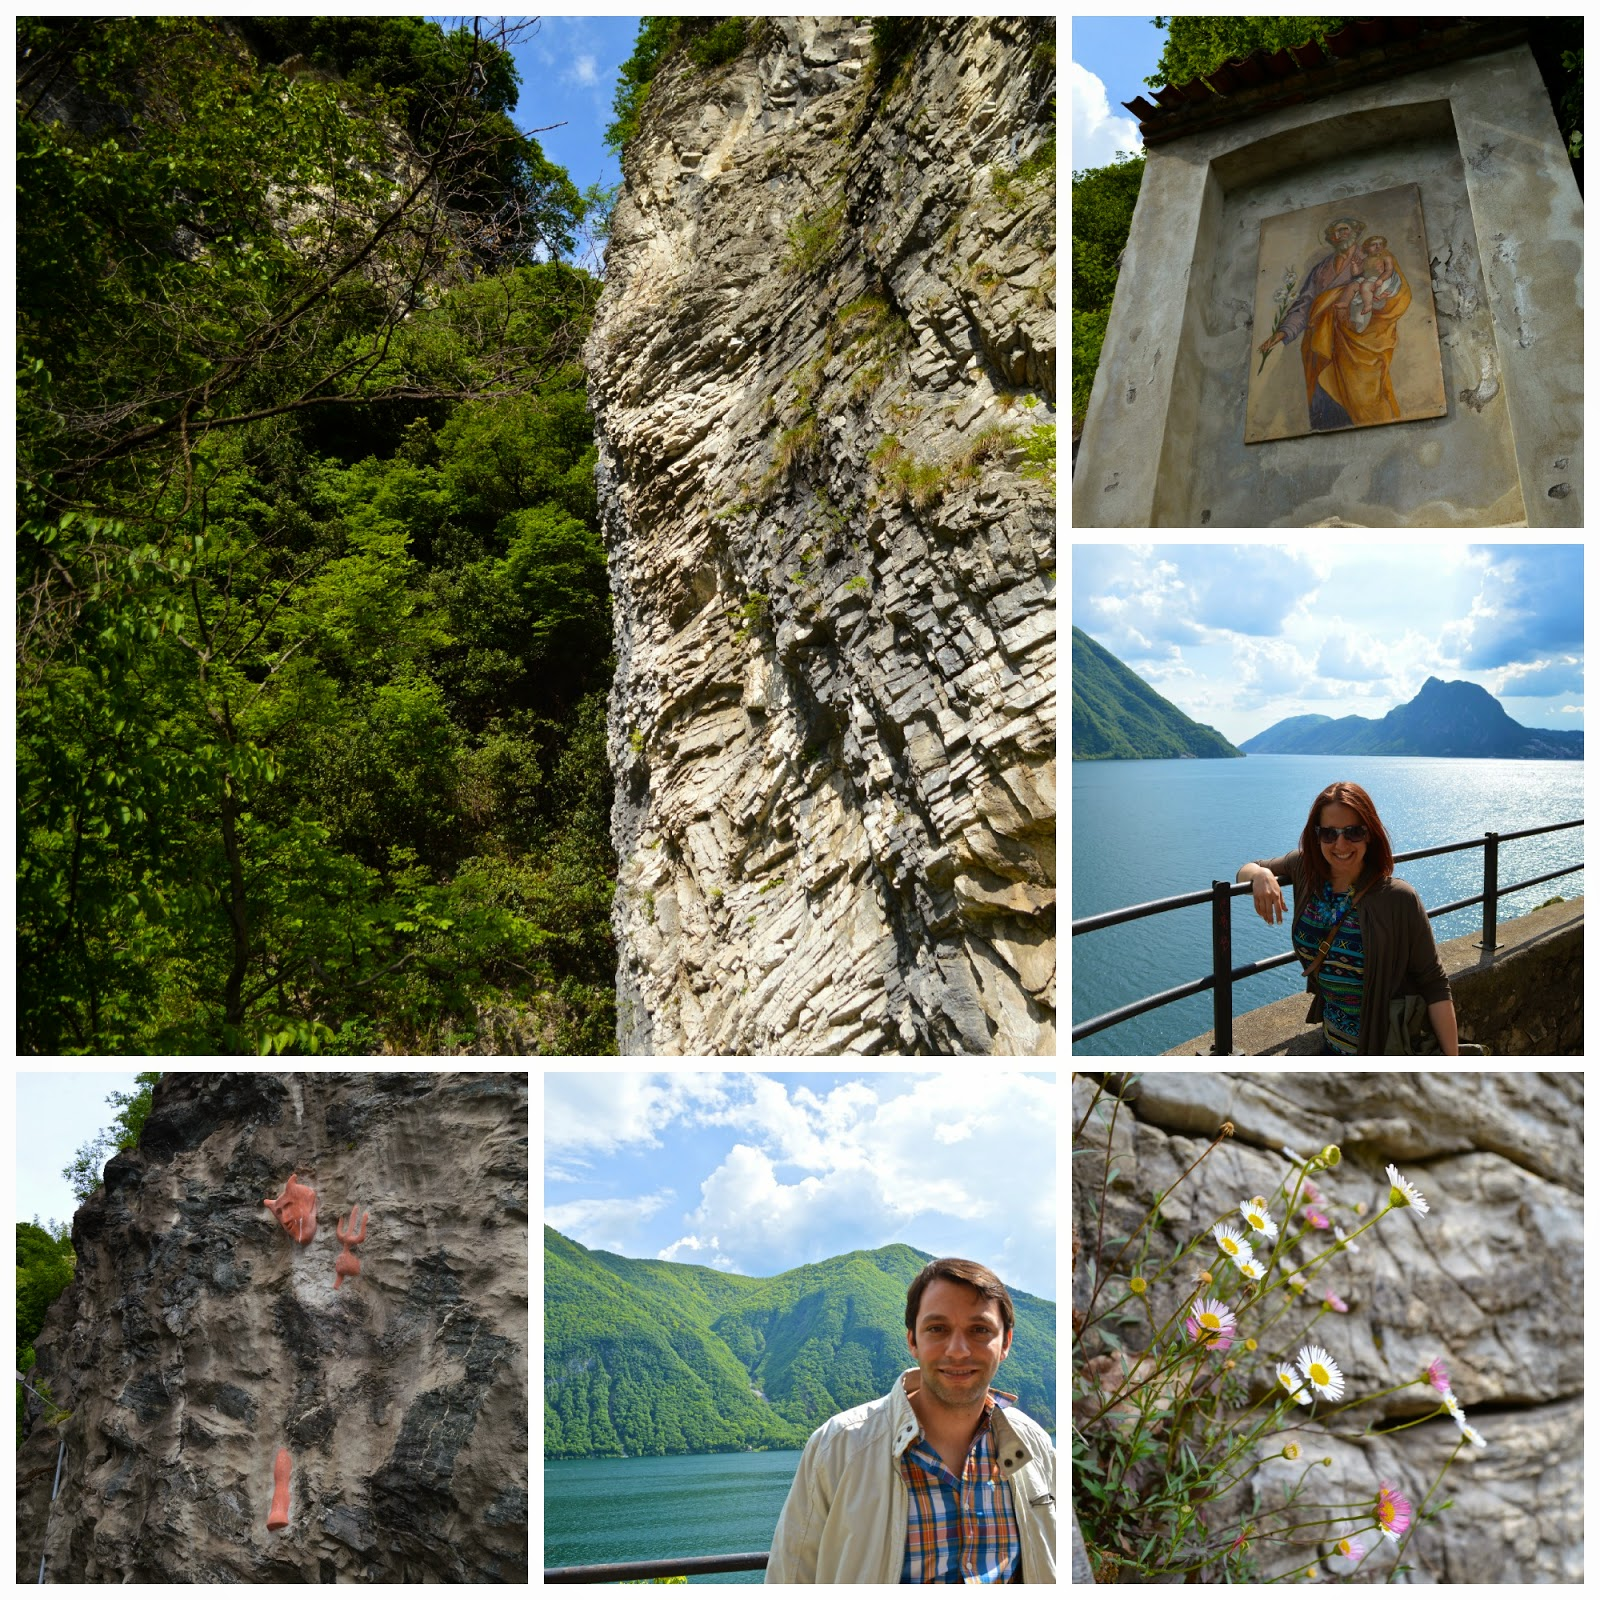 Lugano, Switzerland http://sleachmouradventures.blogspot.com